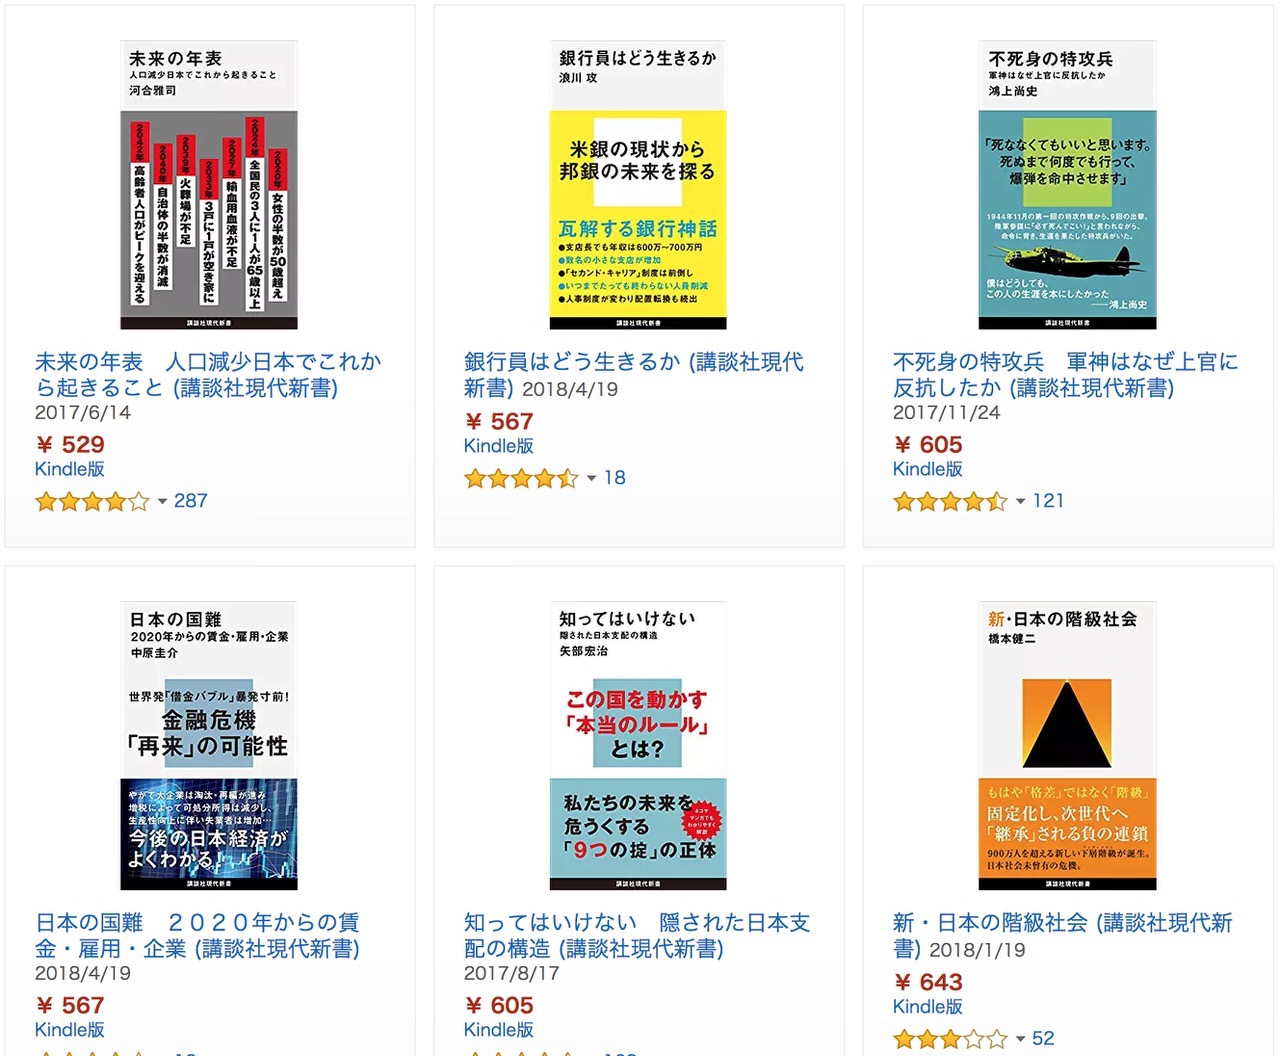 【Kindleセール】30%OFF!講談社「夏☆電書」現代新書プレミアムフェア(7/19まで)